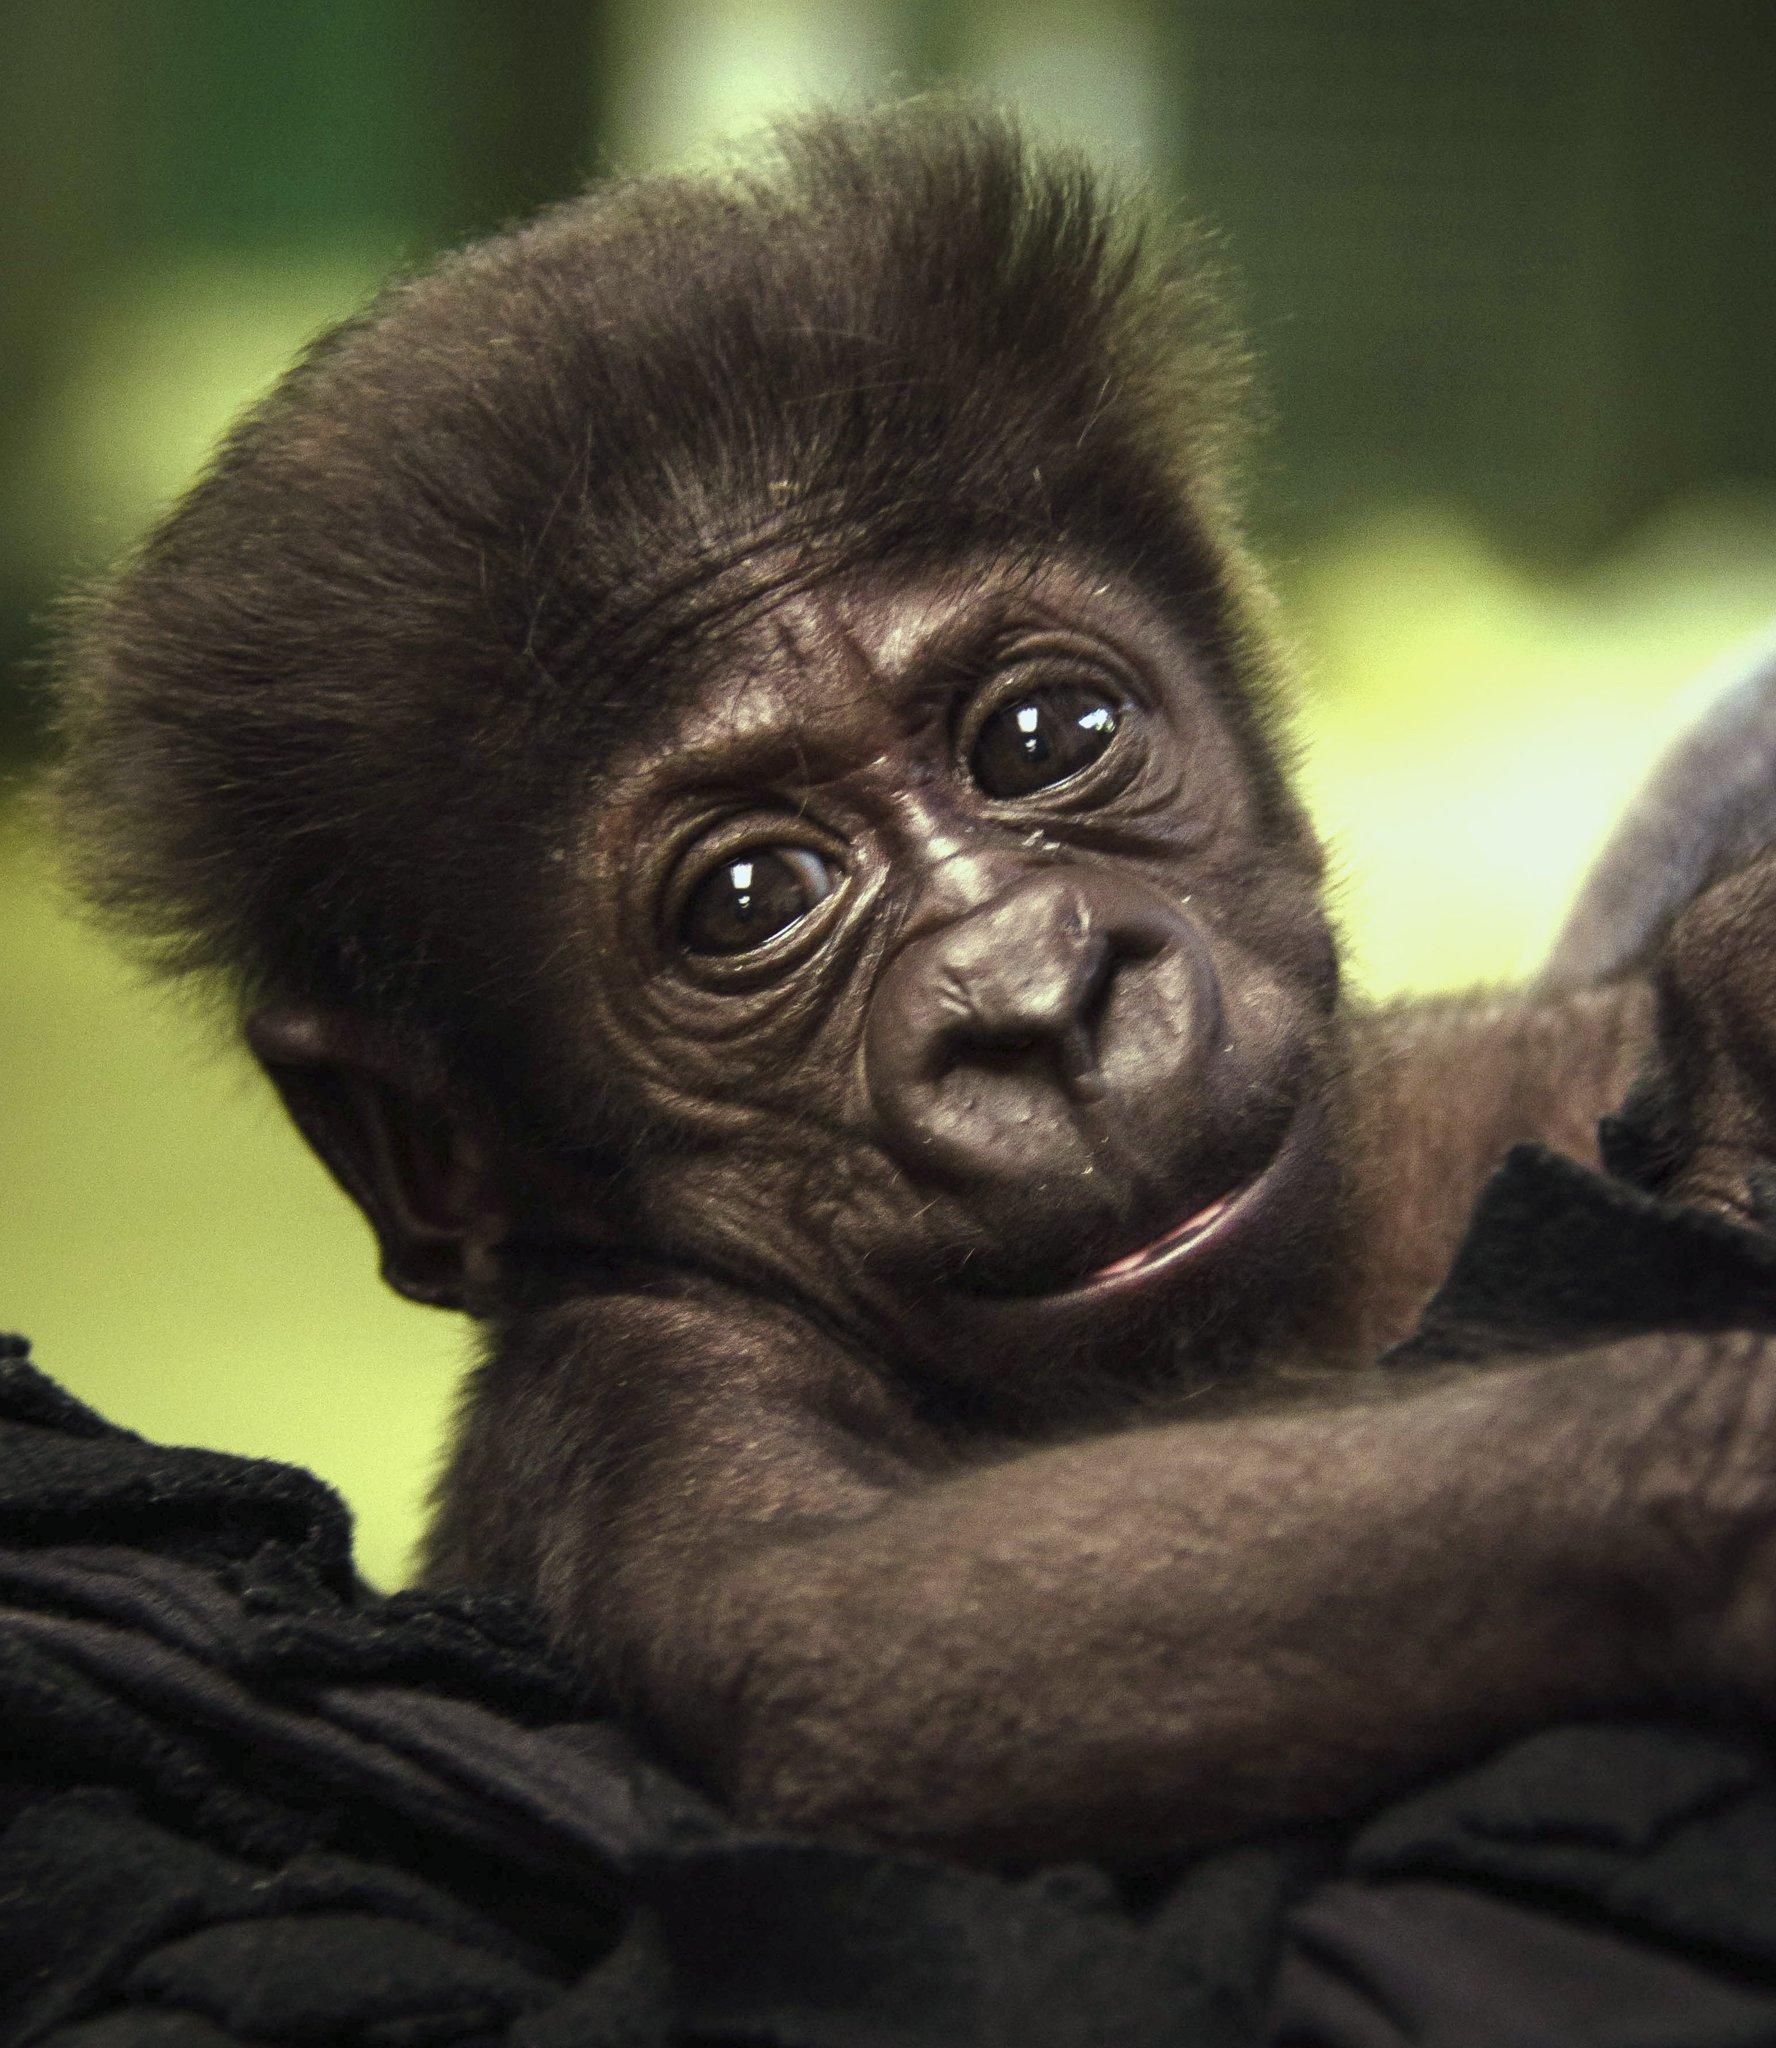 Ostracized baby gorilla will switch zoos chicago tribune